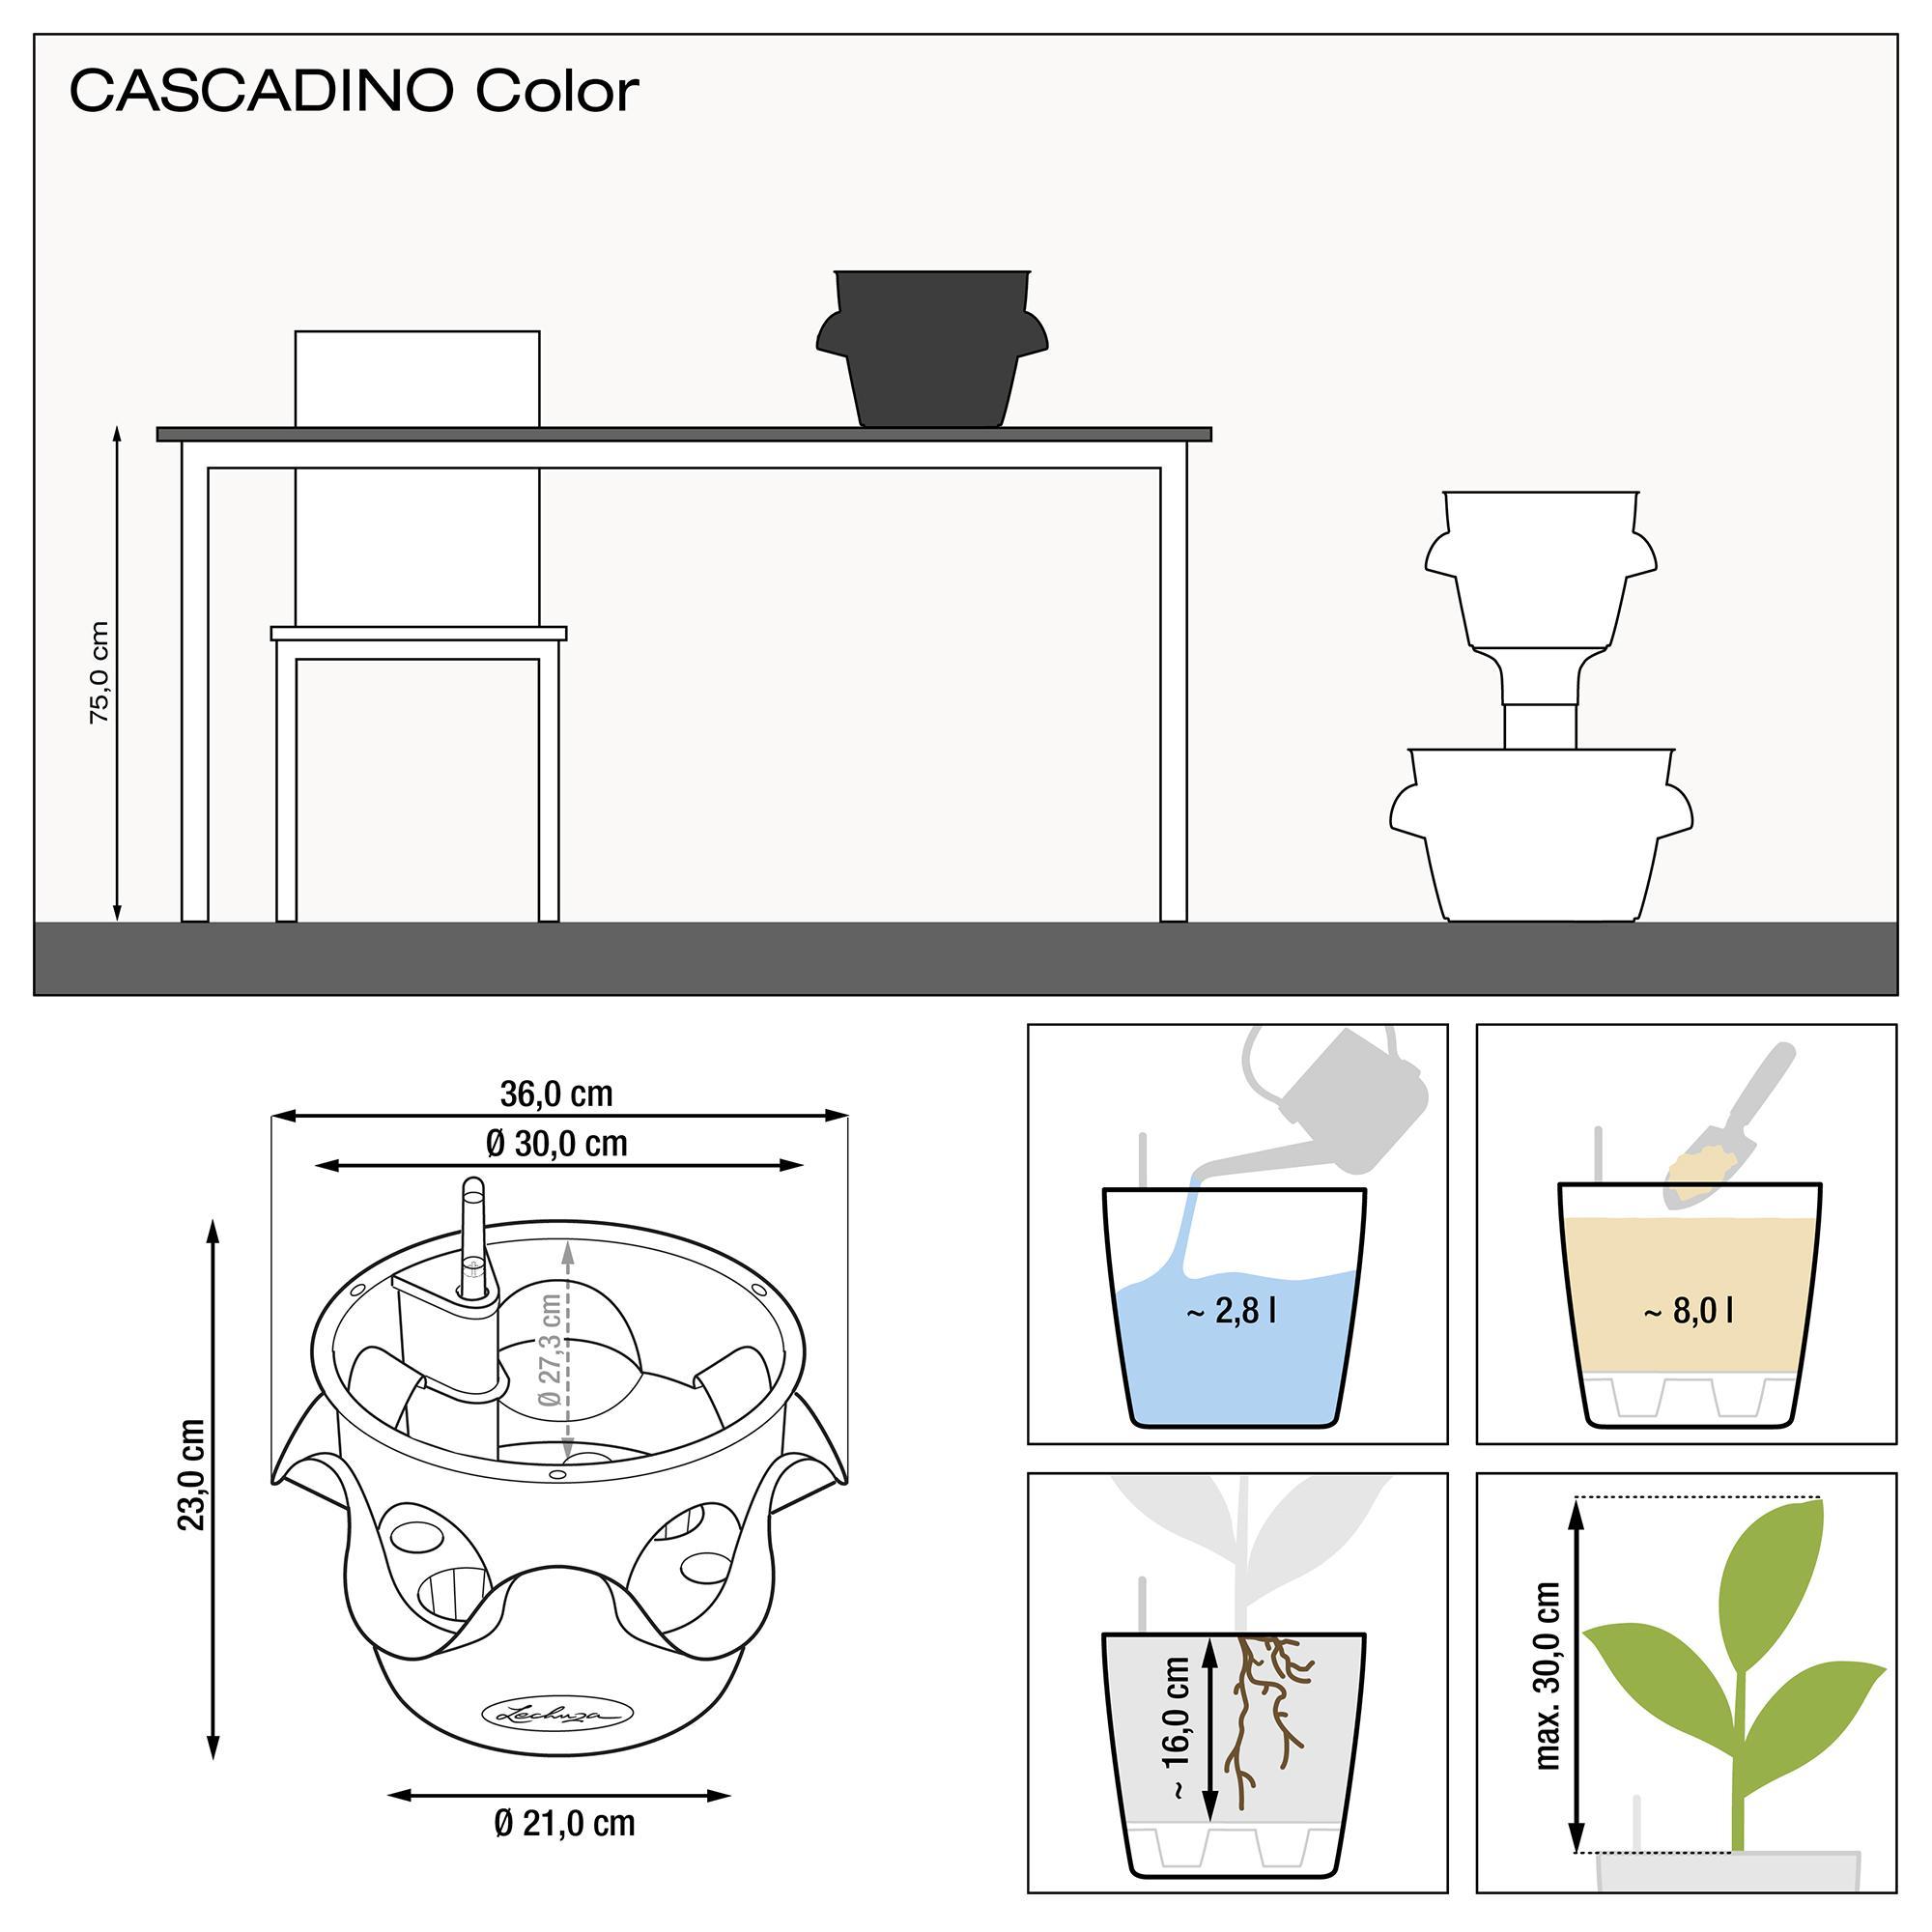 CASCADINO Color pistaziengrün - Bild 2